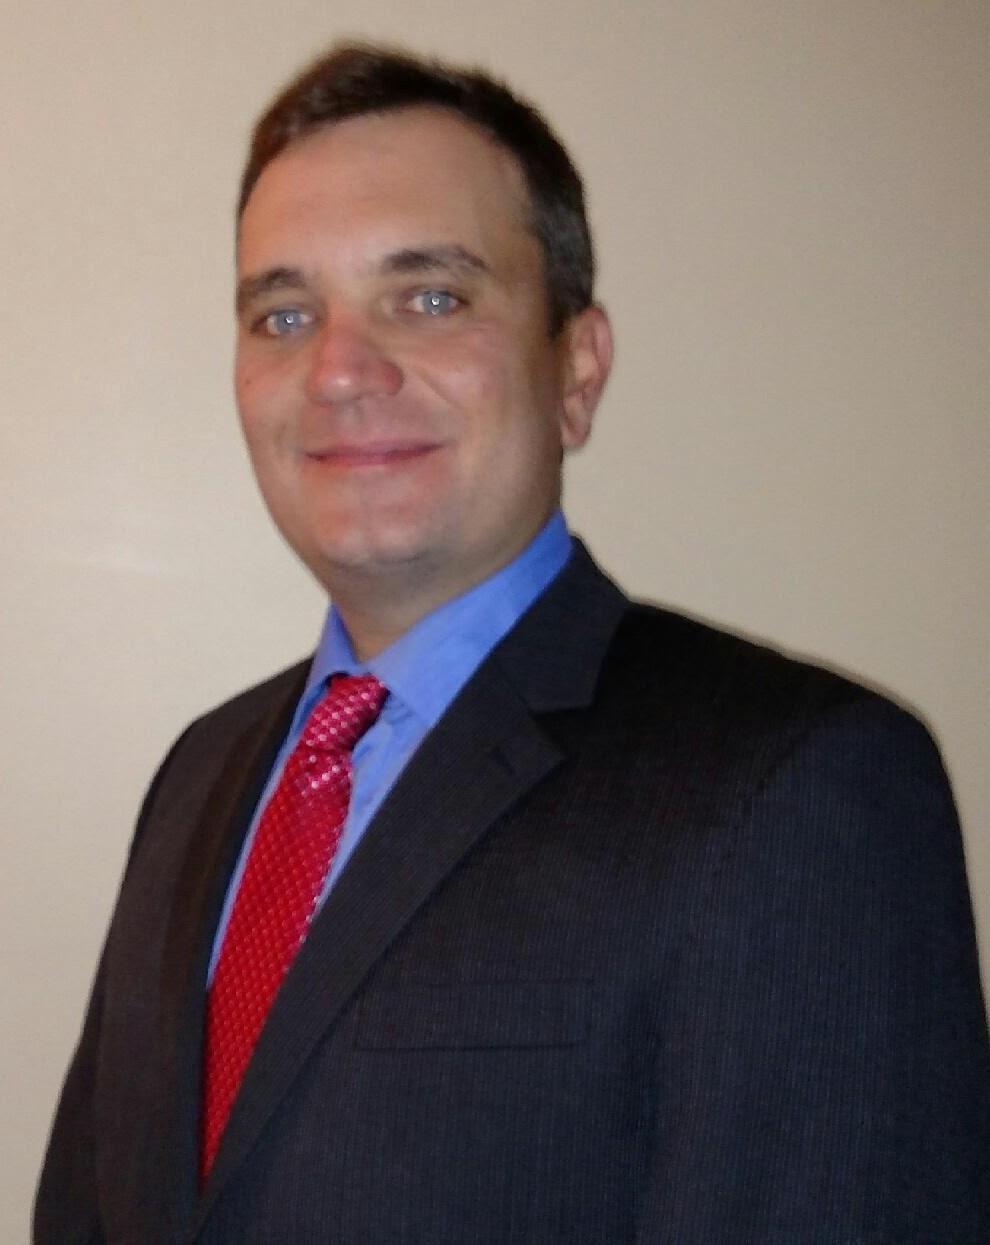 Rodney Robbins